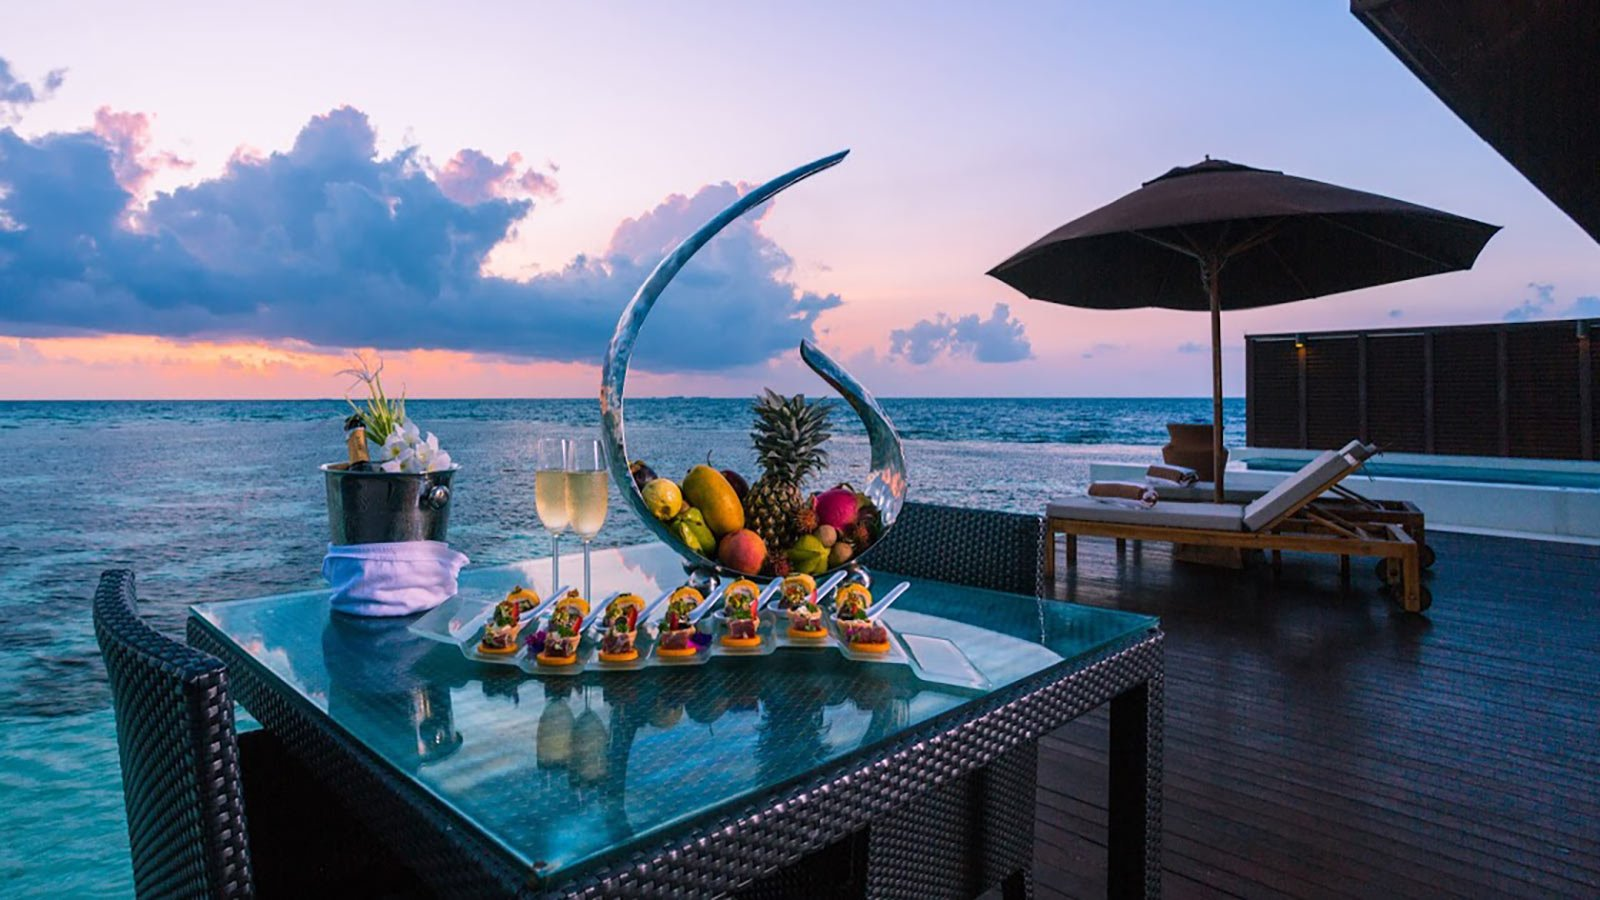 luxury villa maldives beach - photo #27